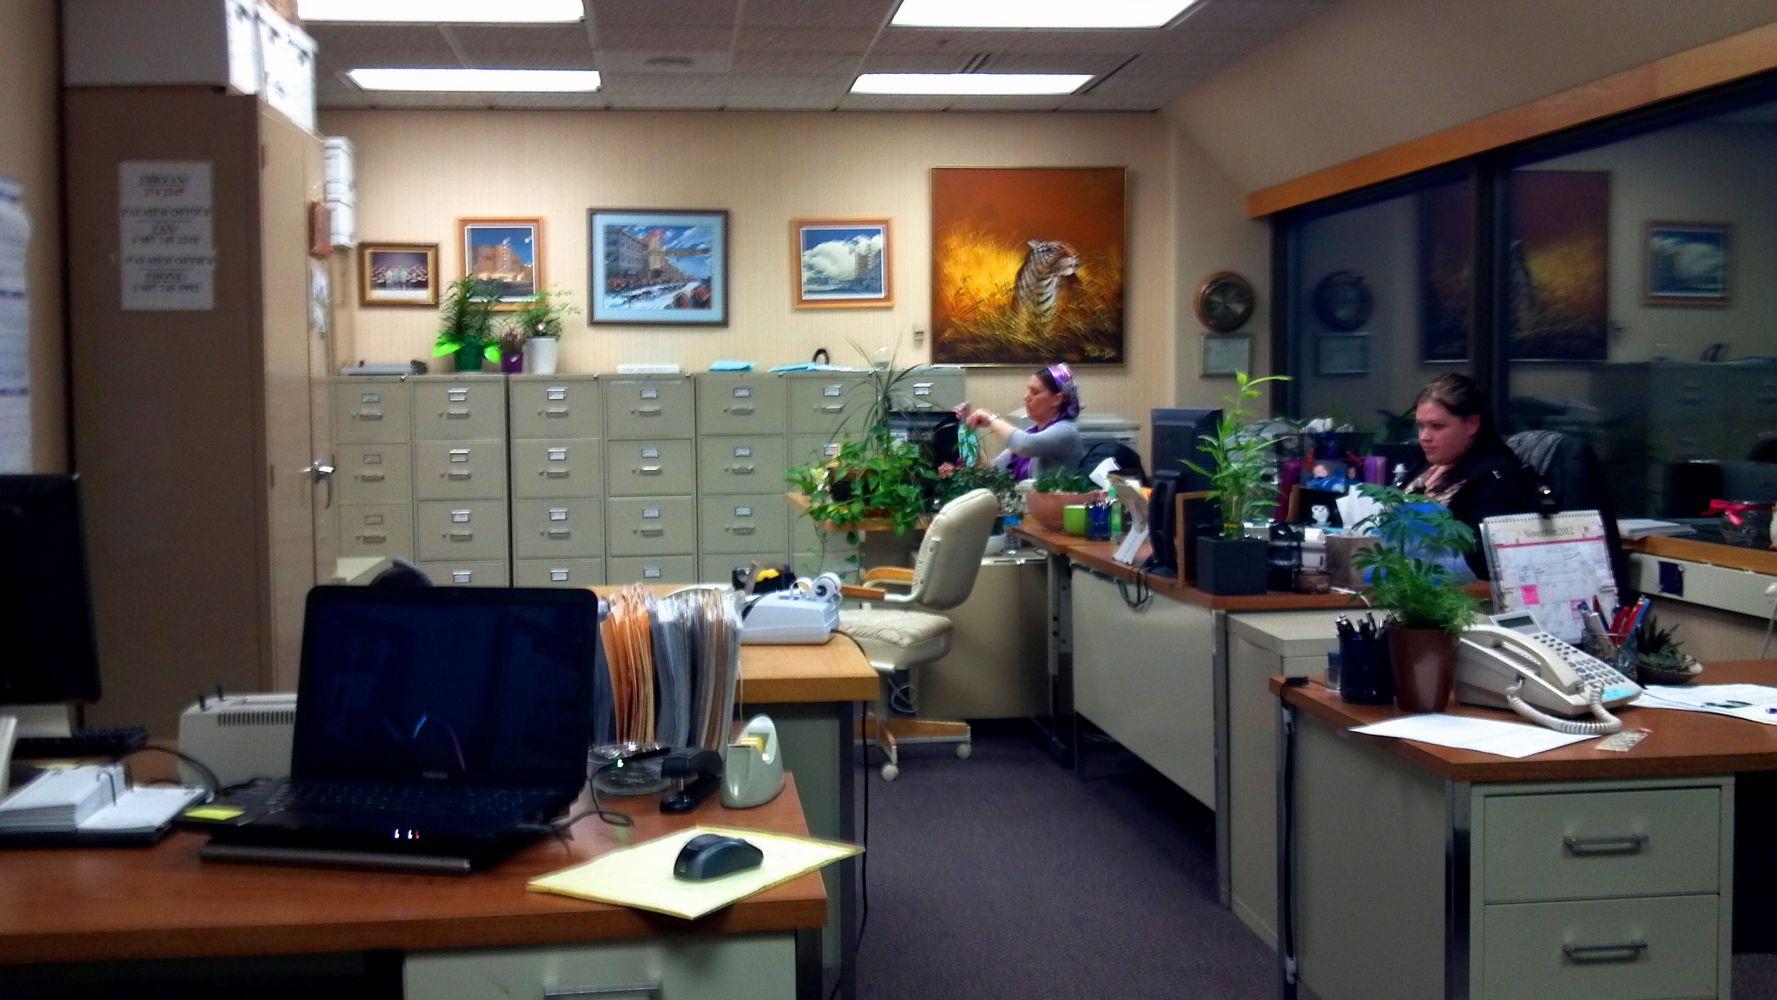 bail bonds service offcie in Anchorage, AK